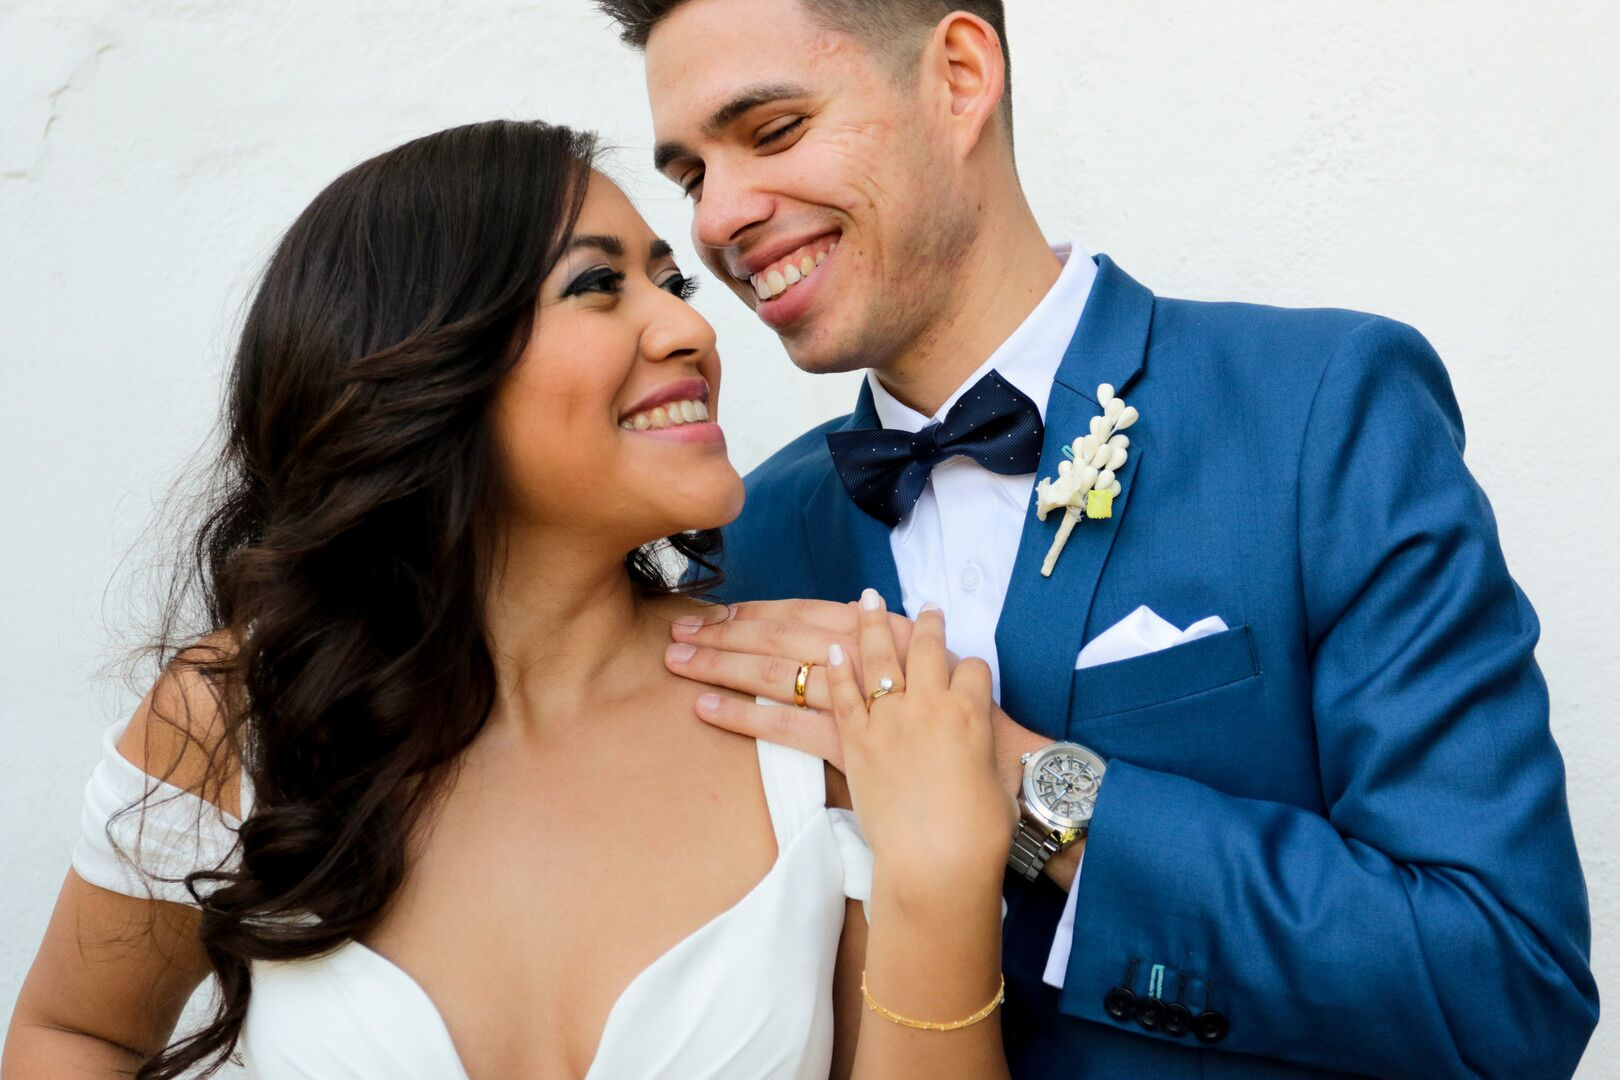 www.santabarbaraweddings.com | Photographer: Trista Maja Photography | Venue: Santa Barbara Courthouse | Wedding Dress: Lulus | Hair: Legends Hair |  Bride and Groom - Rings Focus